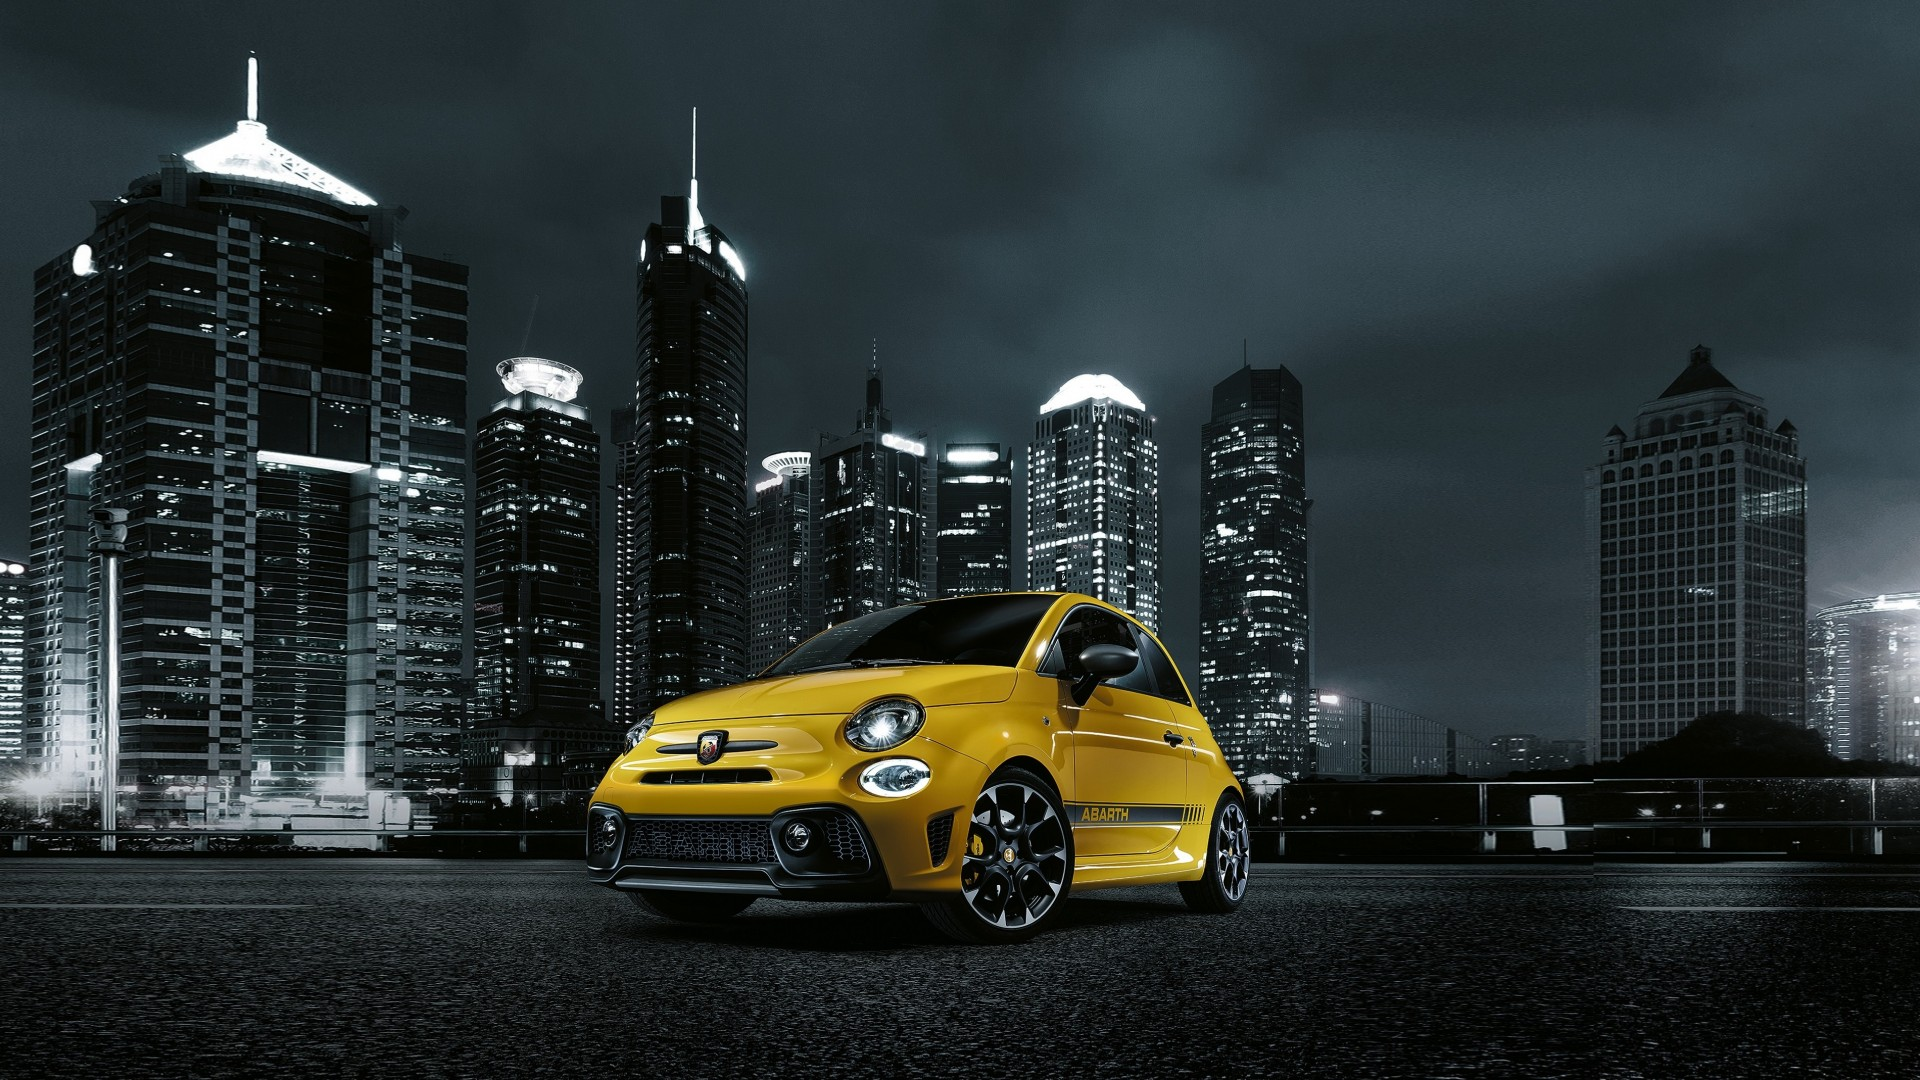 Wallpaper Fiat Abarth 595 Facelift Hatchback Night Town